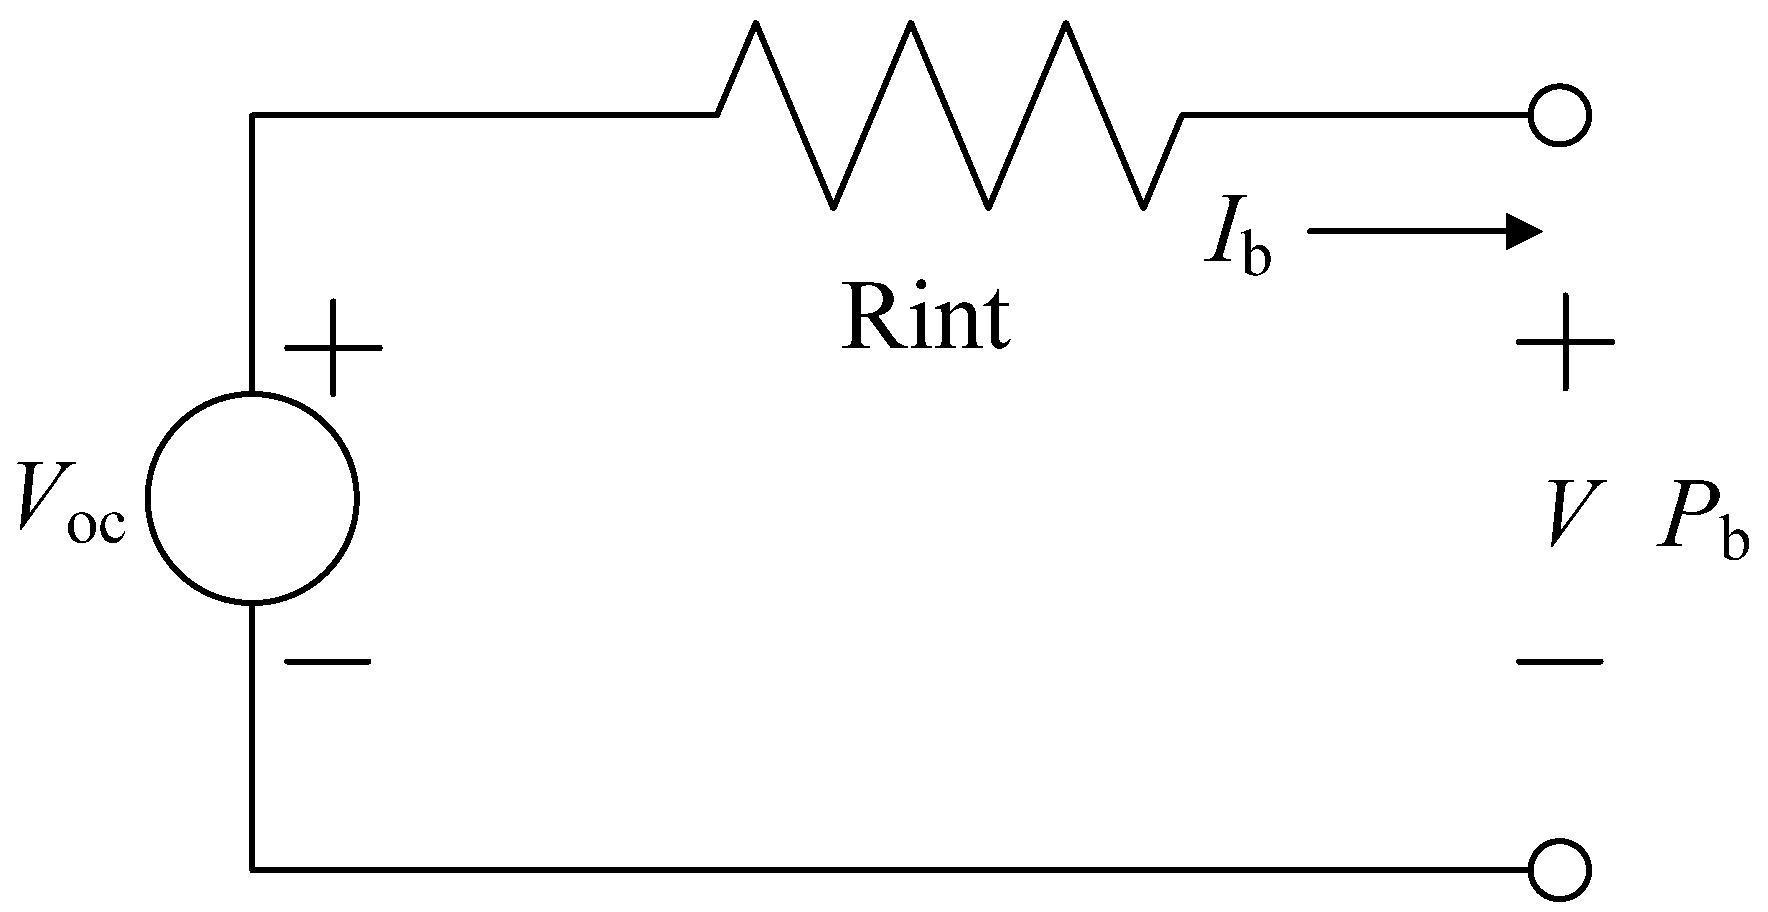 xantrex charge controller wiring diagram xantrex control